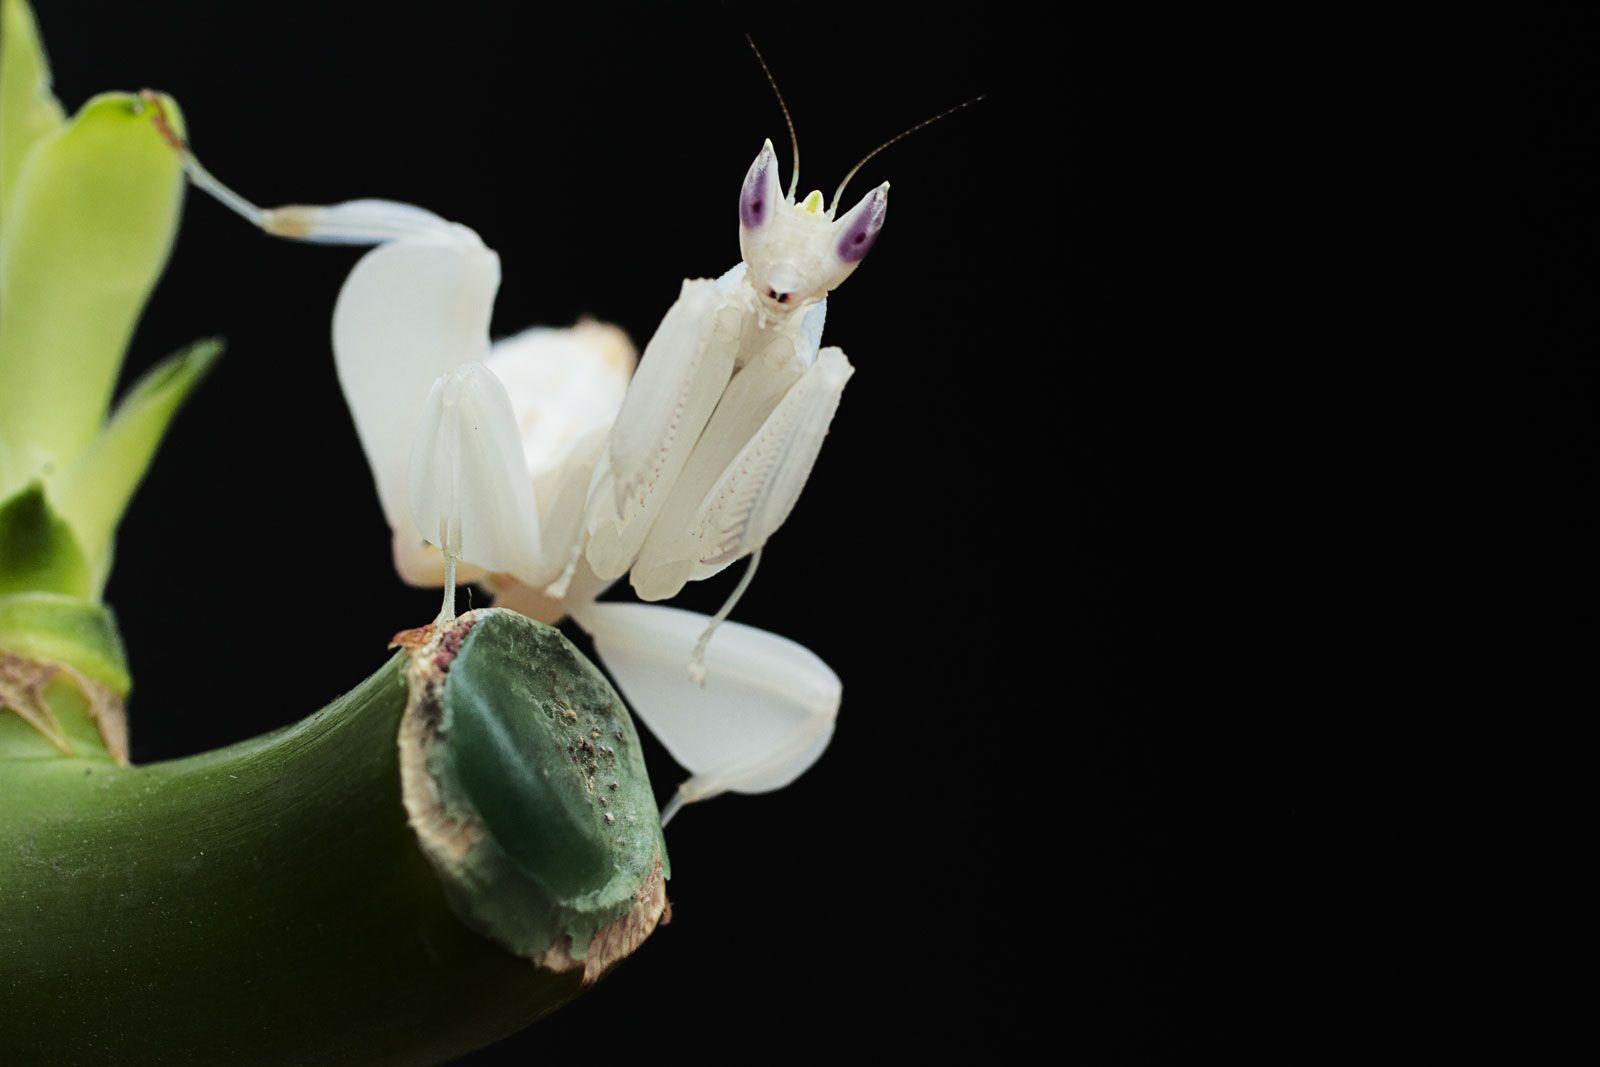 Orchid Praying Mantis Jpg 1600 1067 Orchid Mantis Beautiful